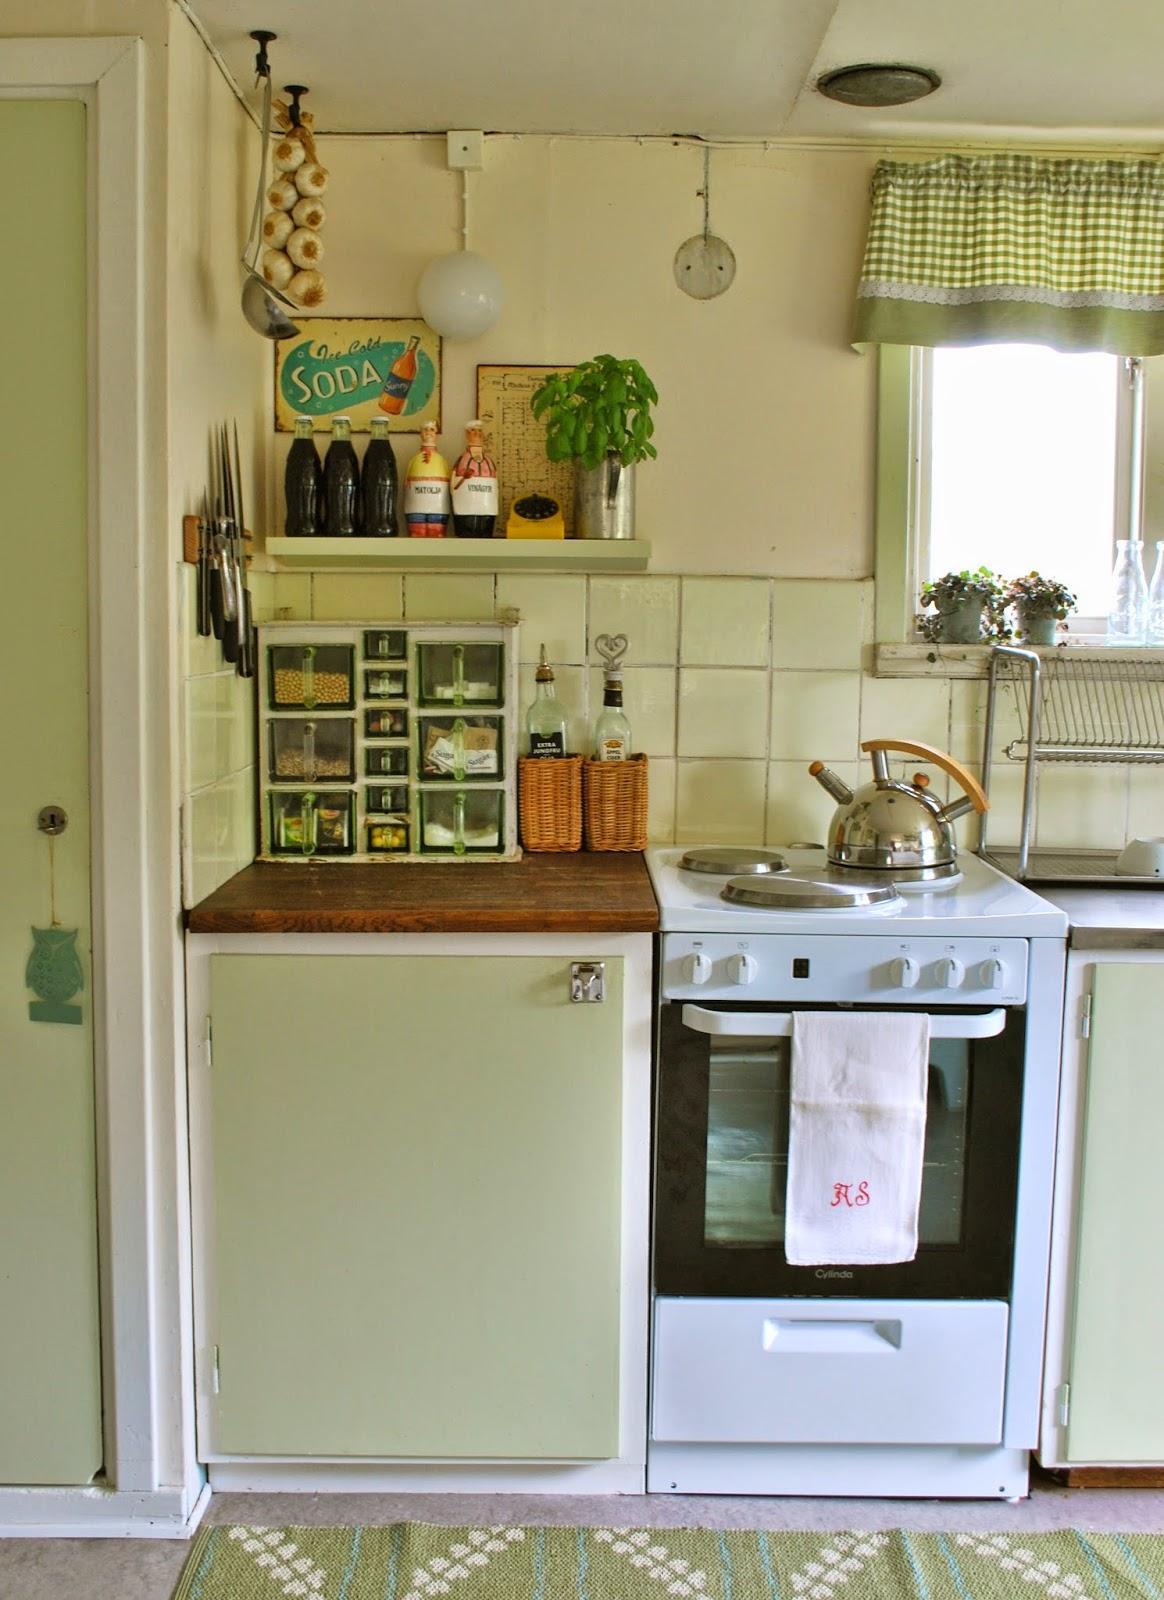 Fröken gröns blogg: augusti 2014